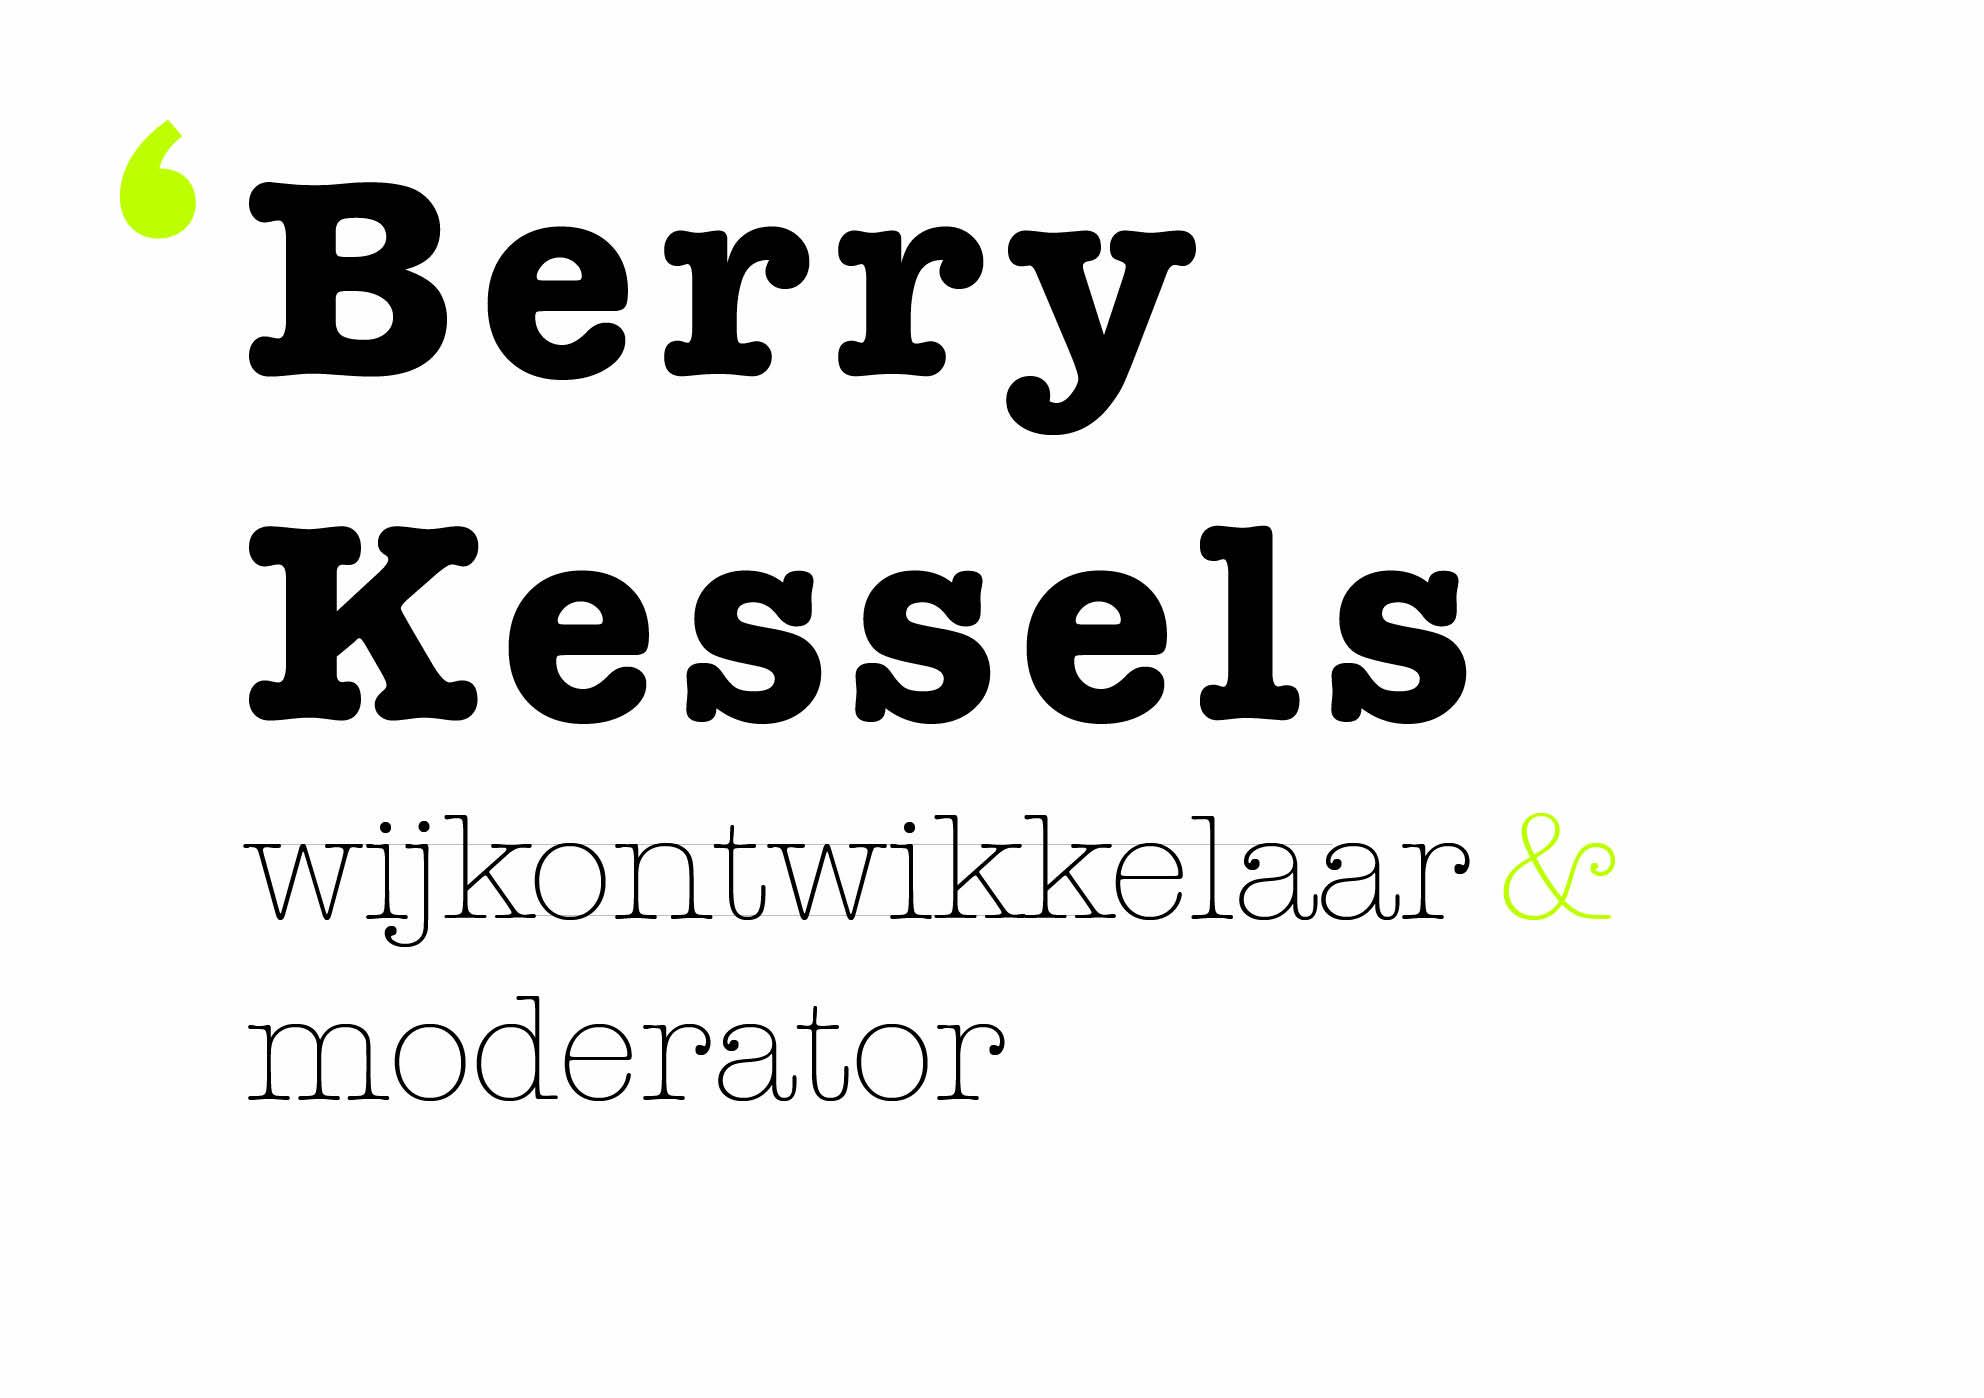 Berry Kessels